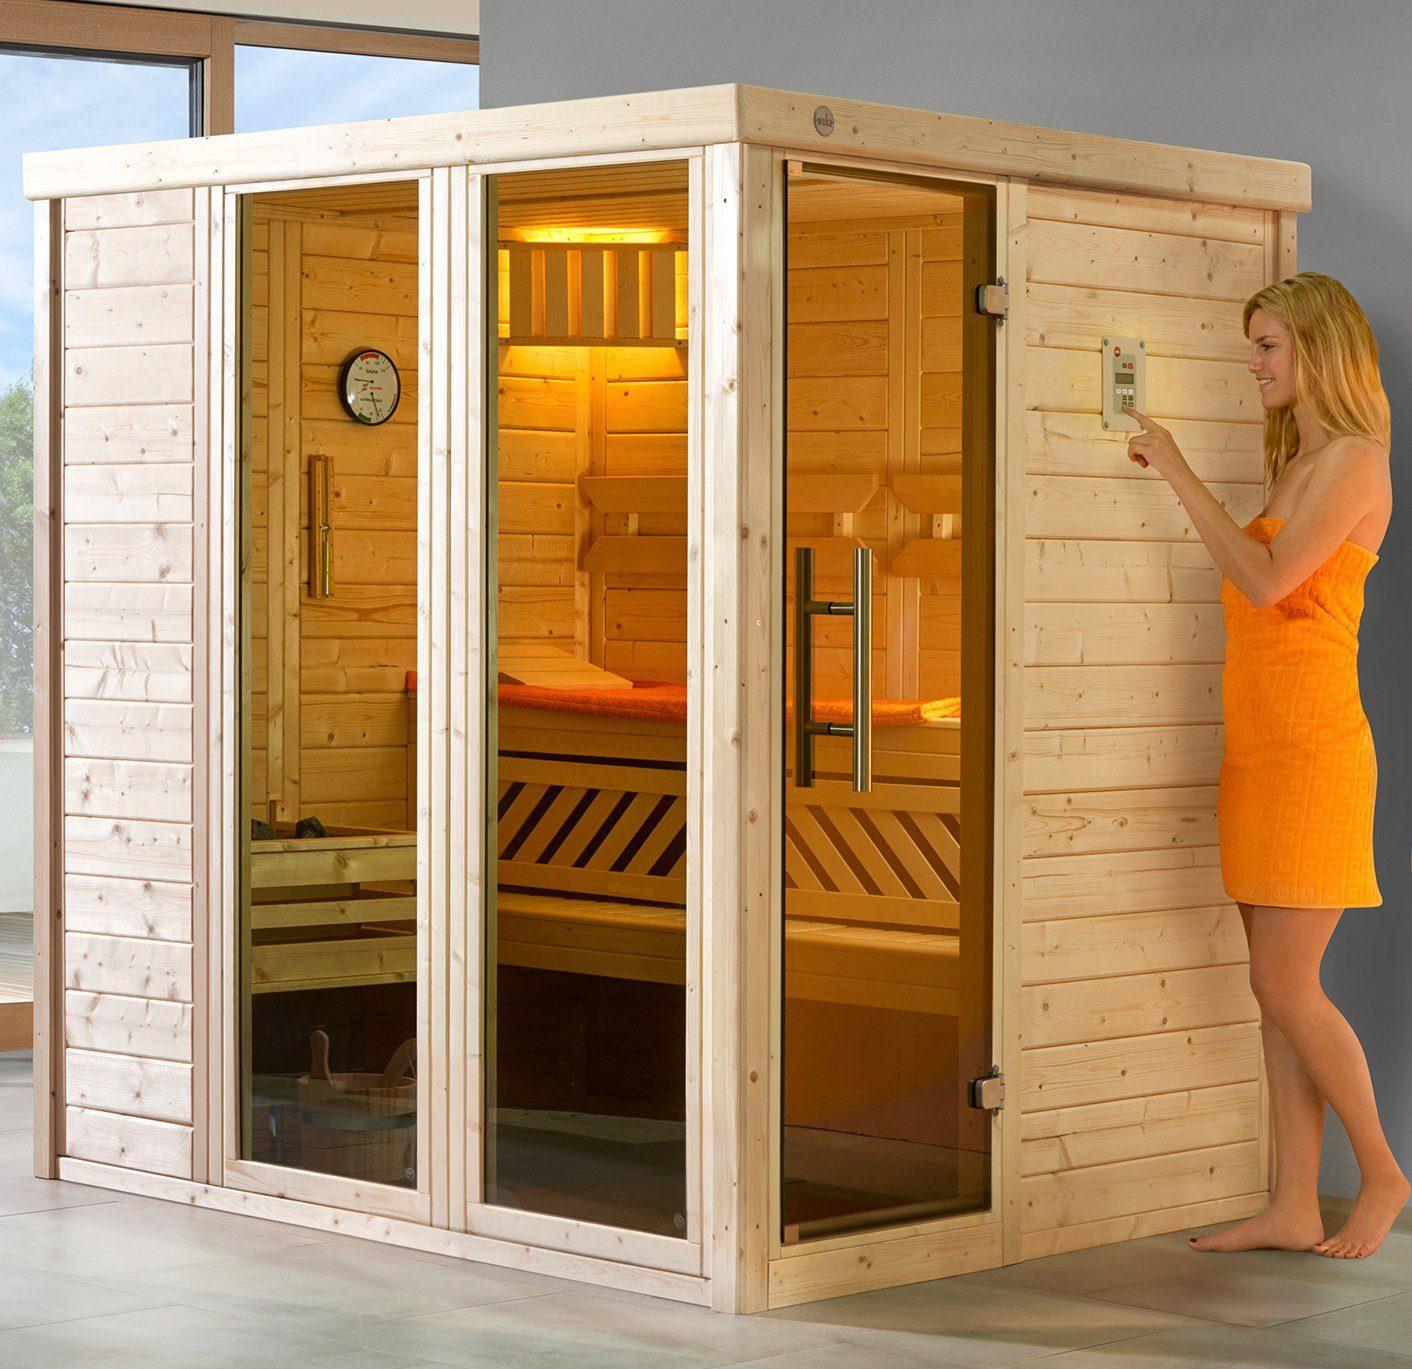 WEKA Sauna »Kemi Gr.1«, 162x193x200 cm, ohne Ofen, mit 2 Fenstern